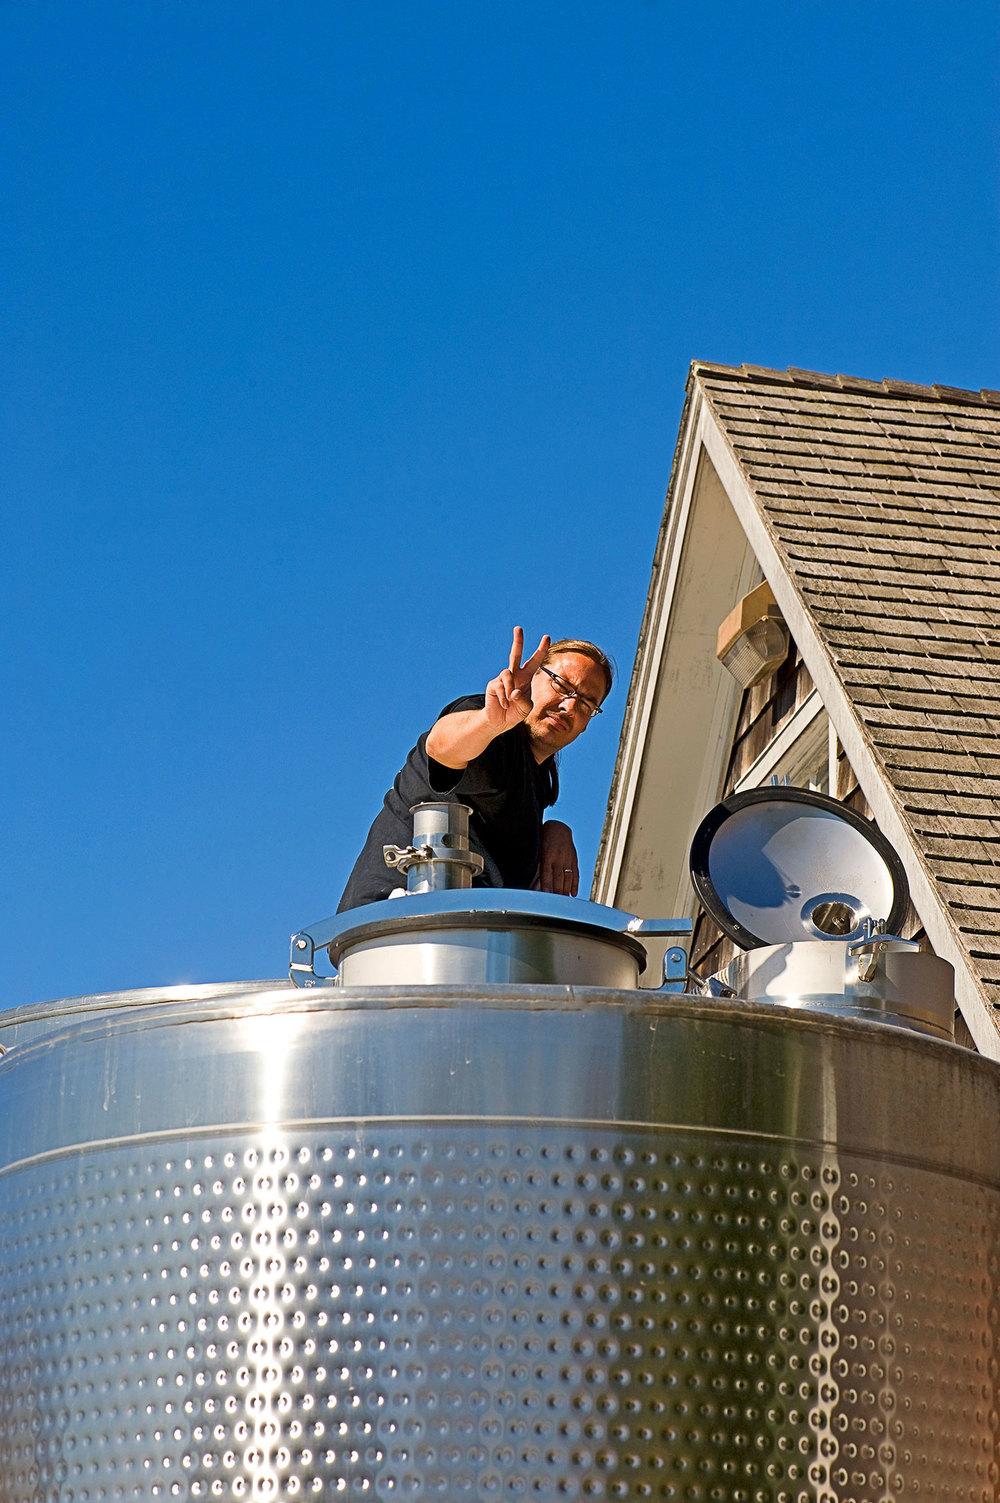 winemaker on top of wine tank